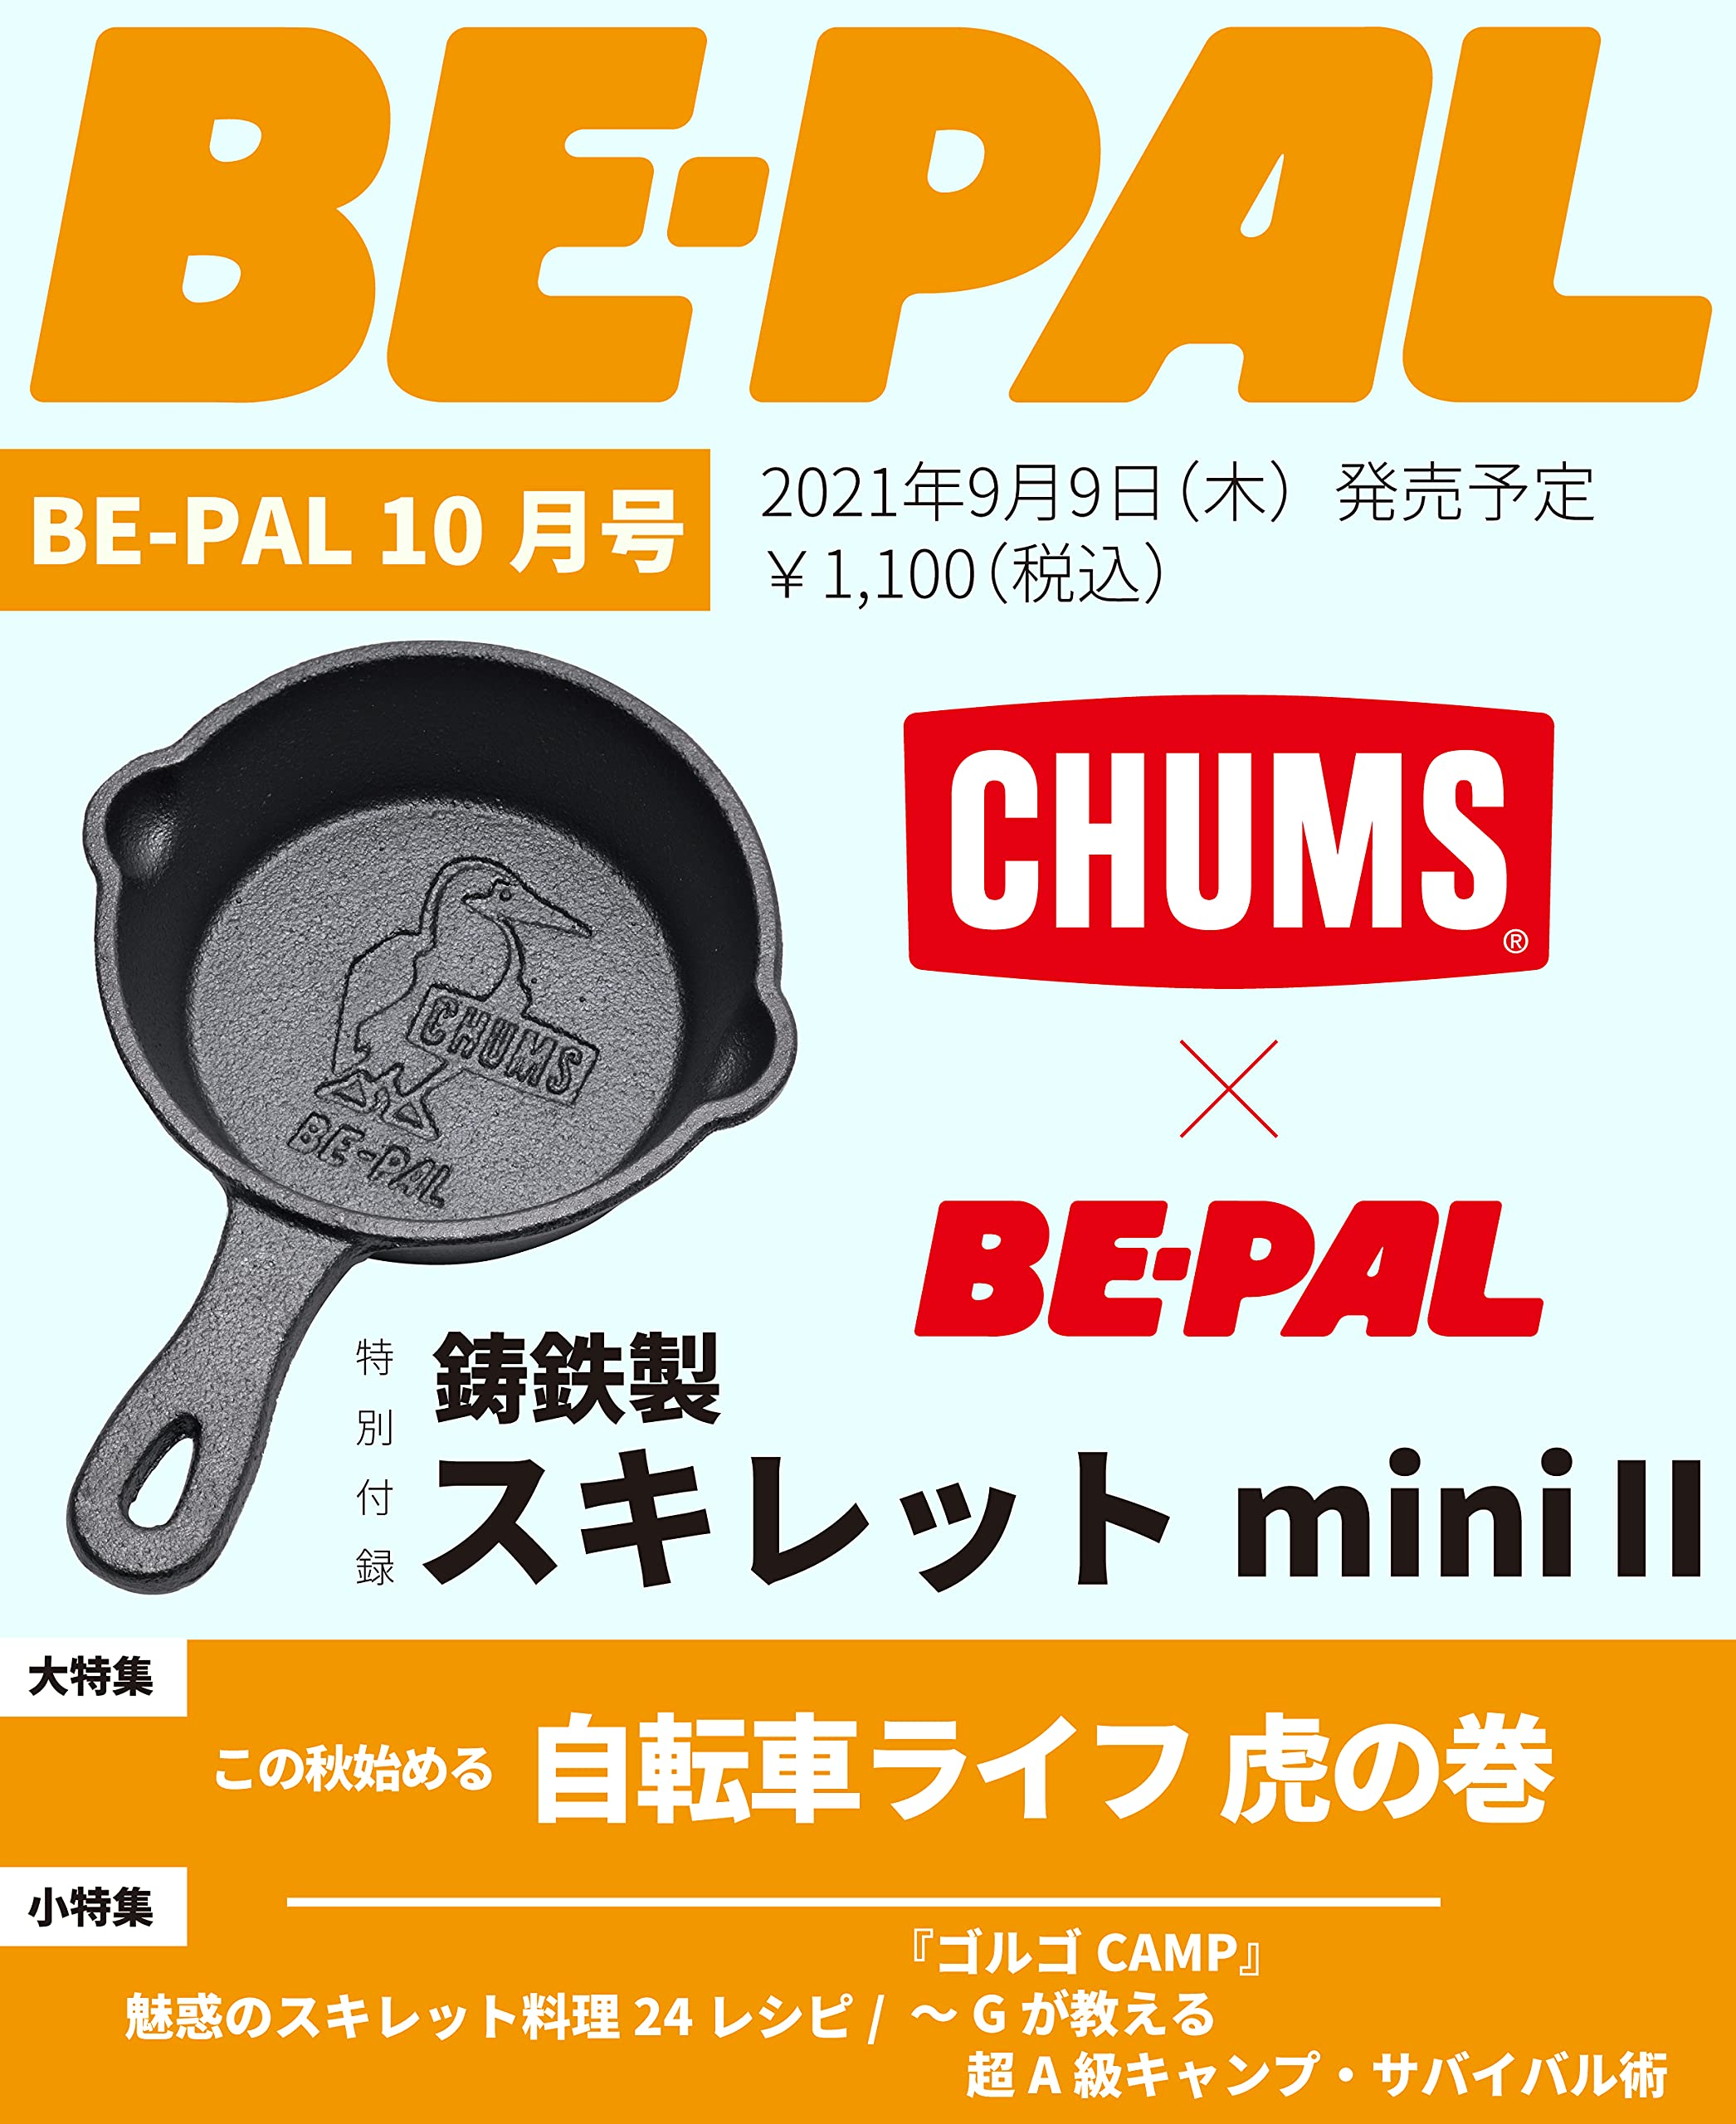 BE-PAL(ビーパル) 2021年10月号付録はCHUMS(チャムス)鋳鉄製スキレットminiII